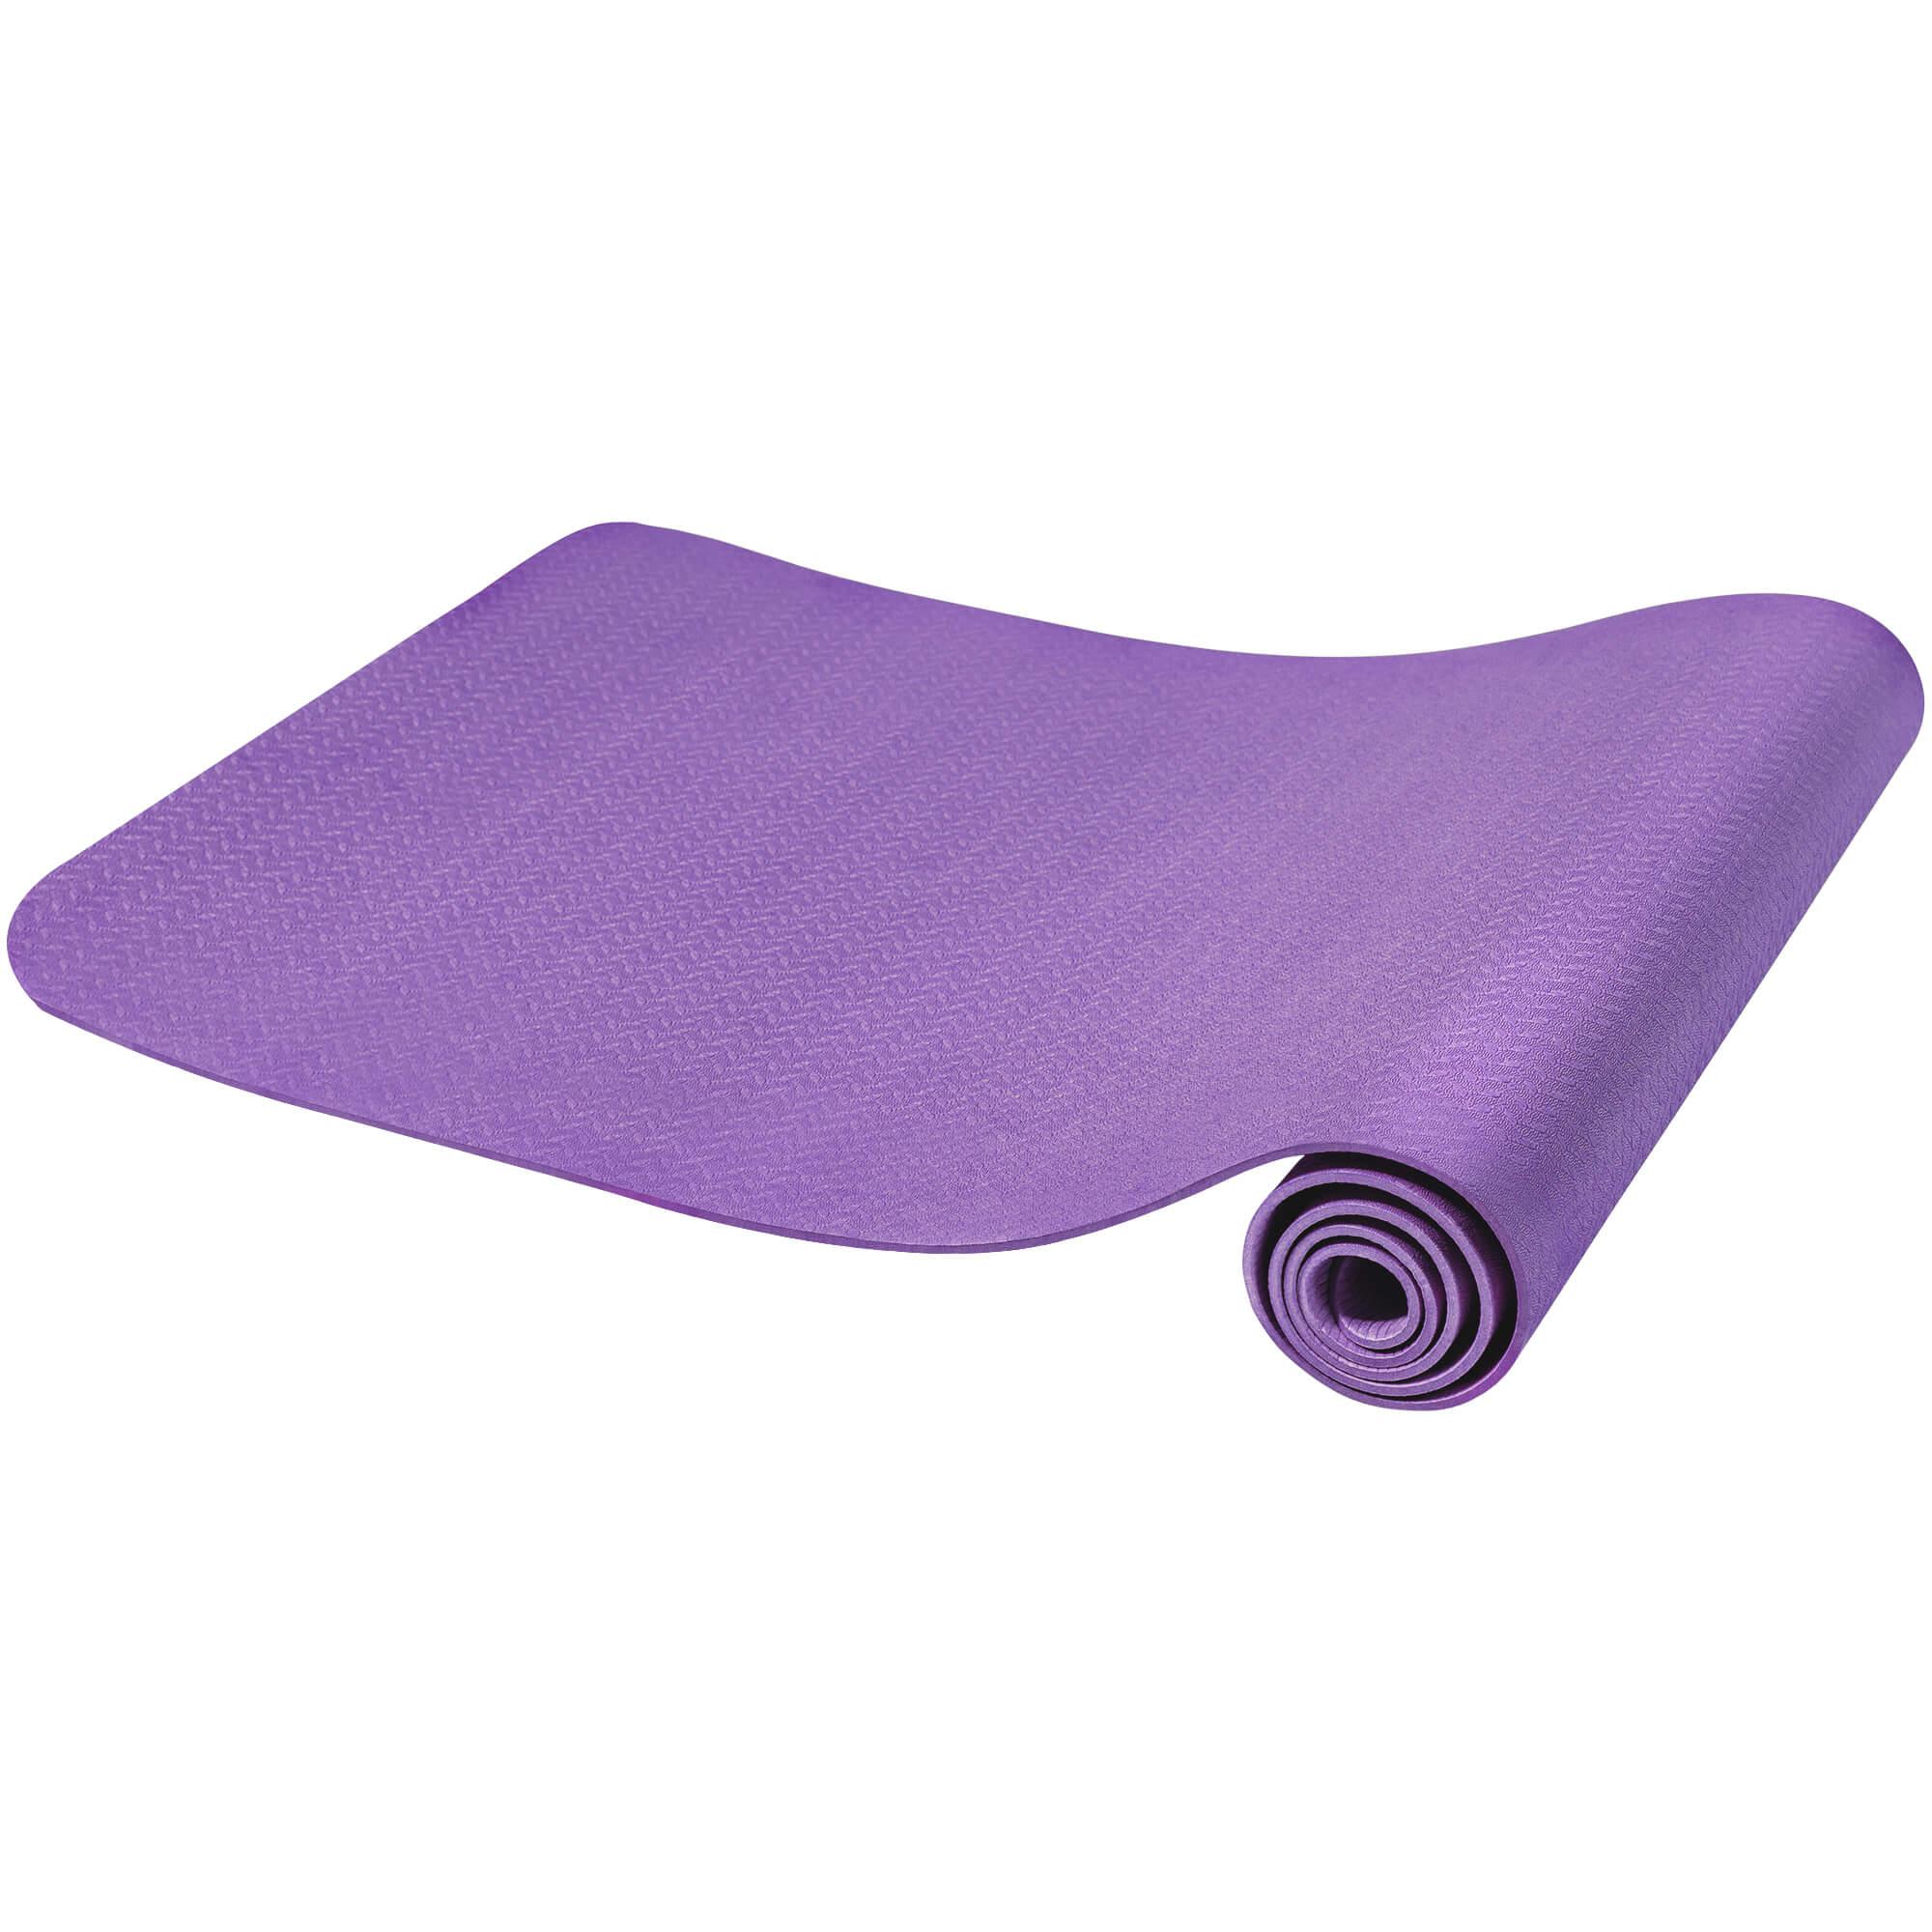 Gorilla Sports Yogamatte Dünn Purple 10 mm 100815-00040-0072